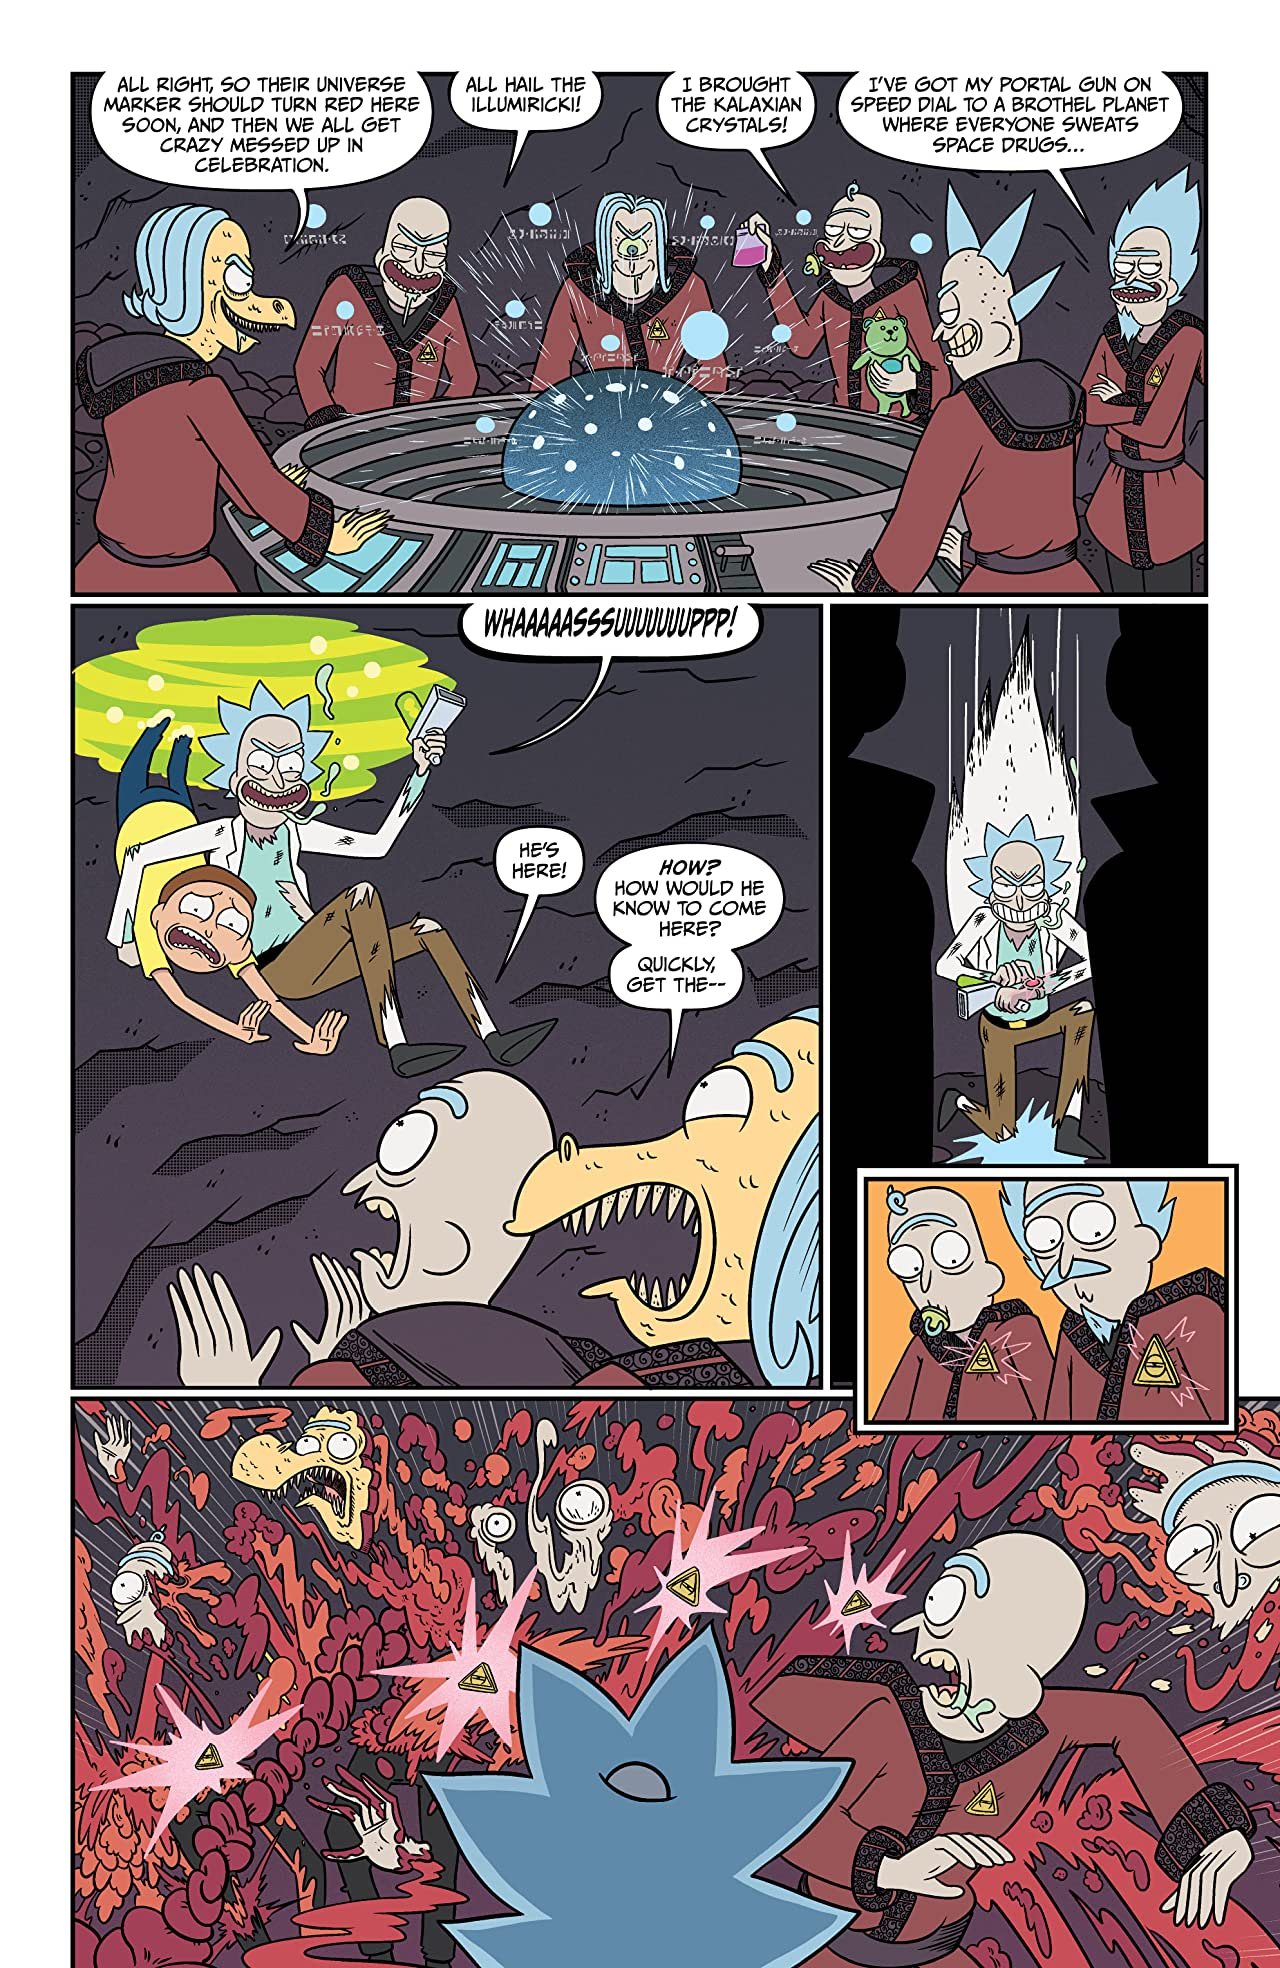 Rick and Morty #60